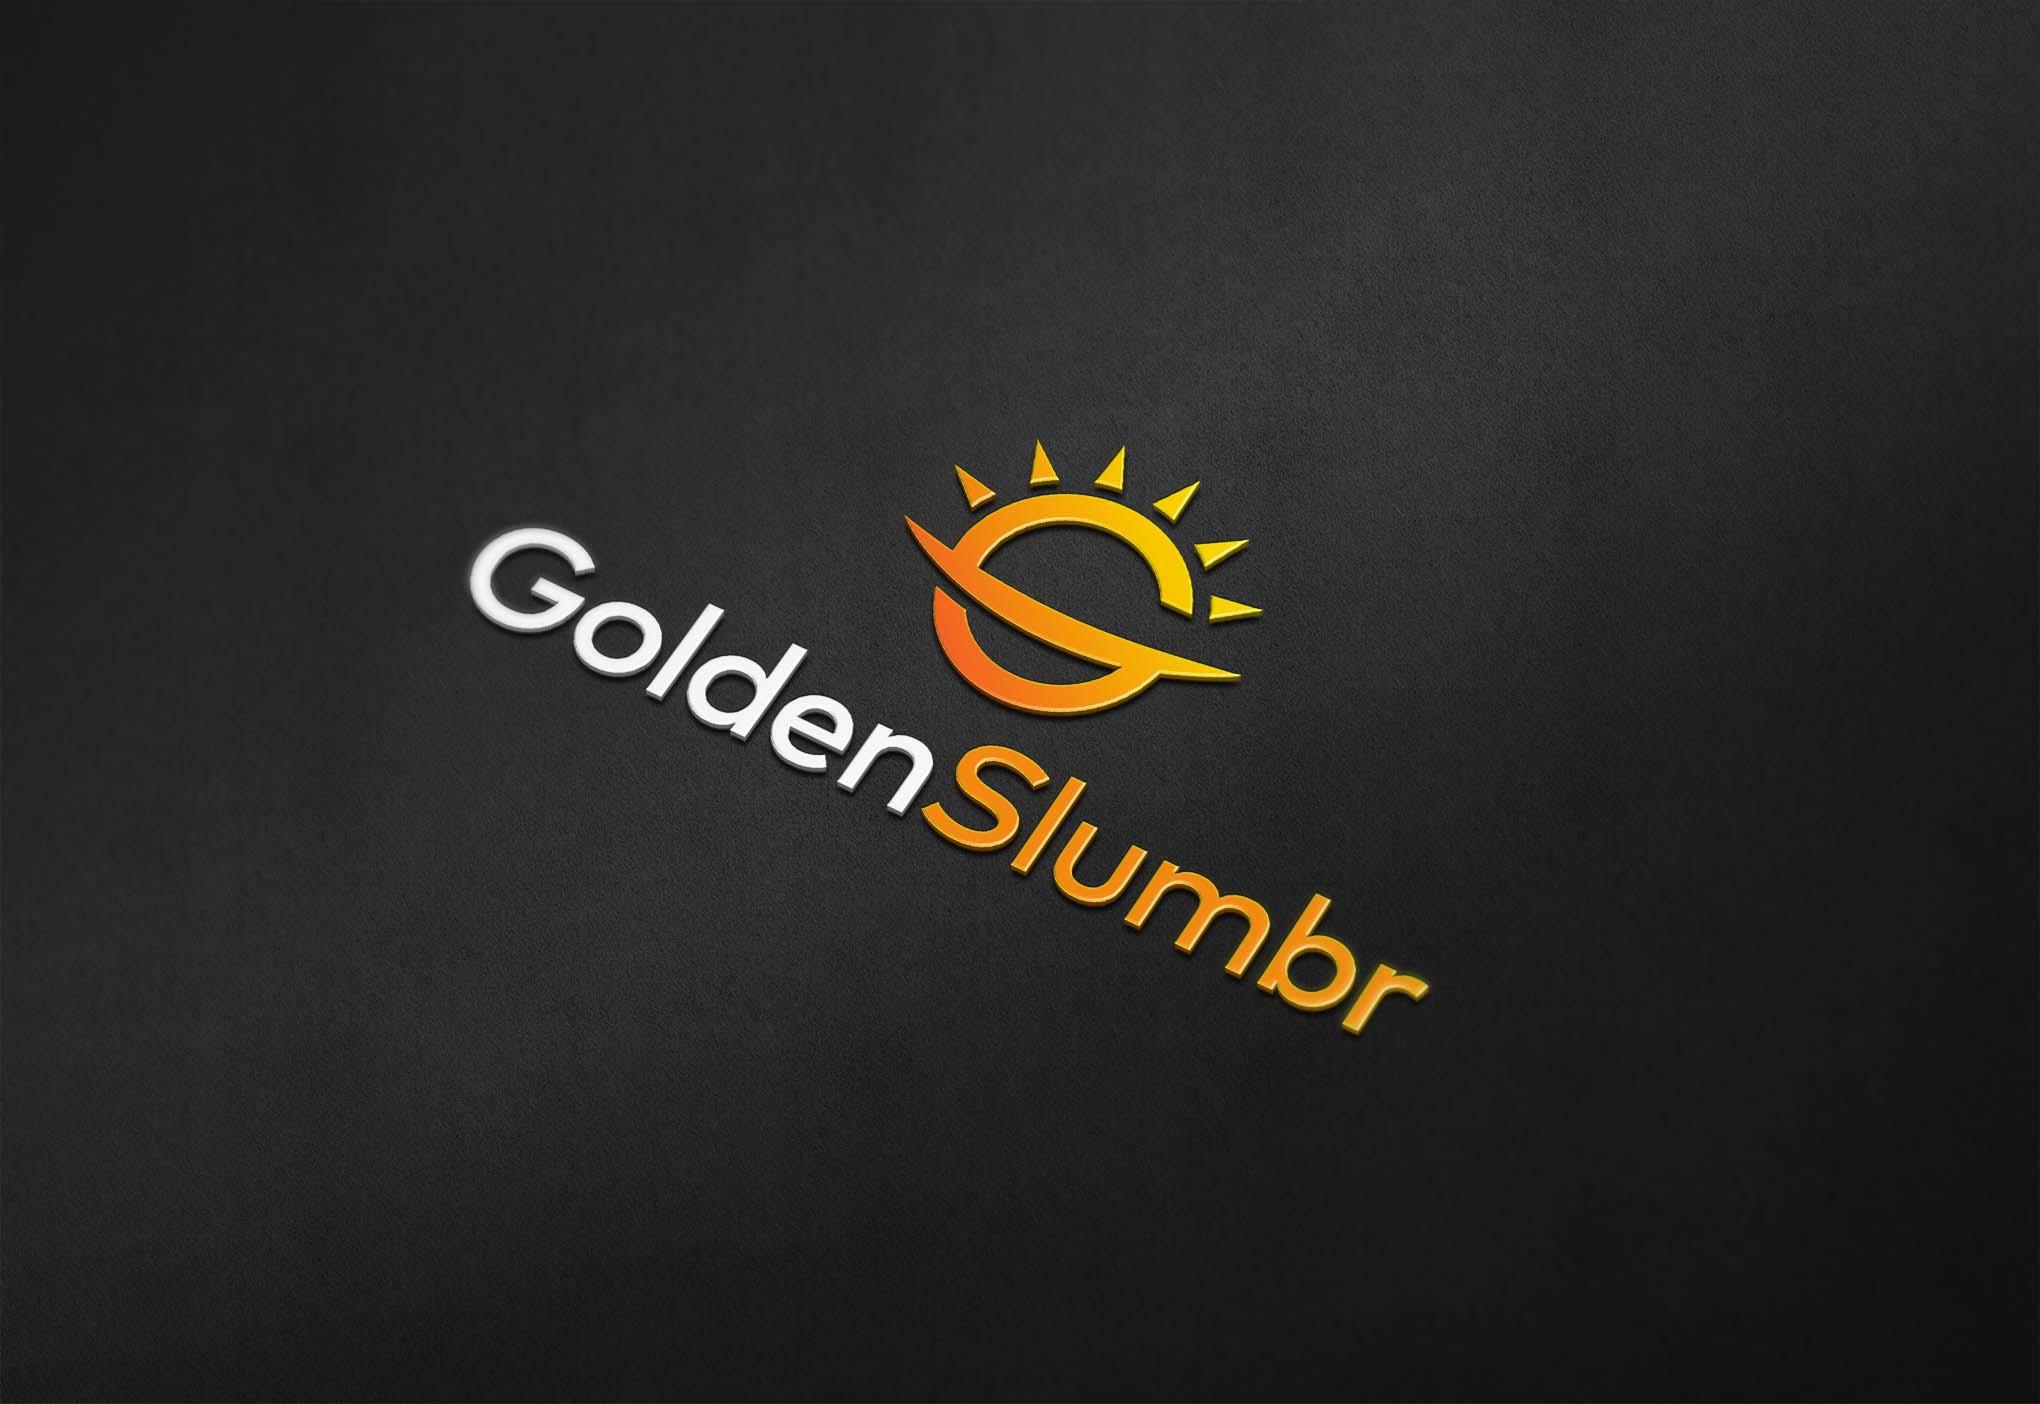 Golden Slumbr - Improving sleep hygiene and over all wellness.